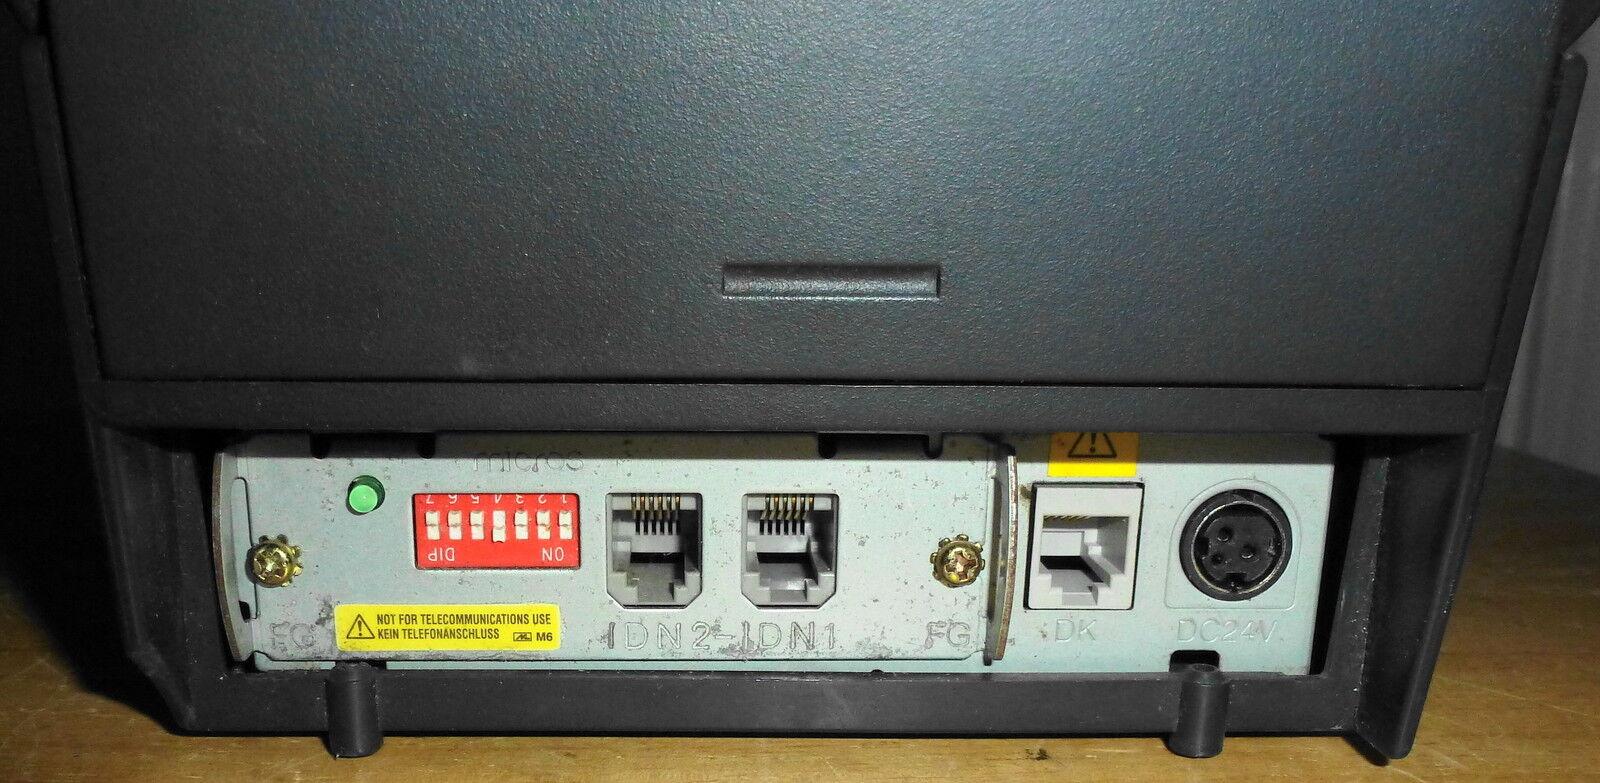 Epson tm t88iii User Manual Pdf